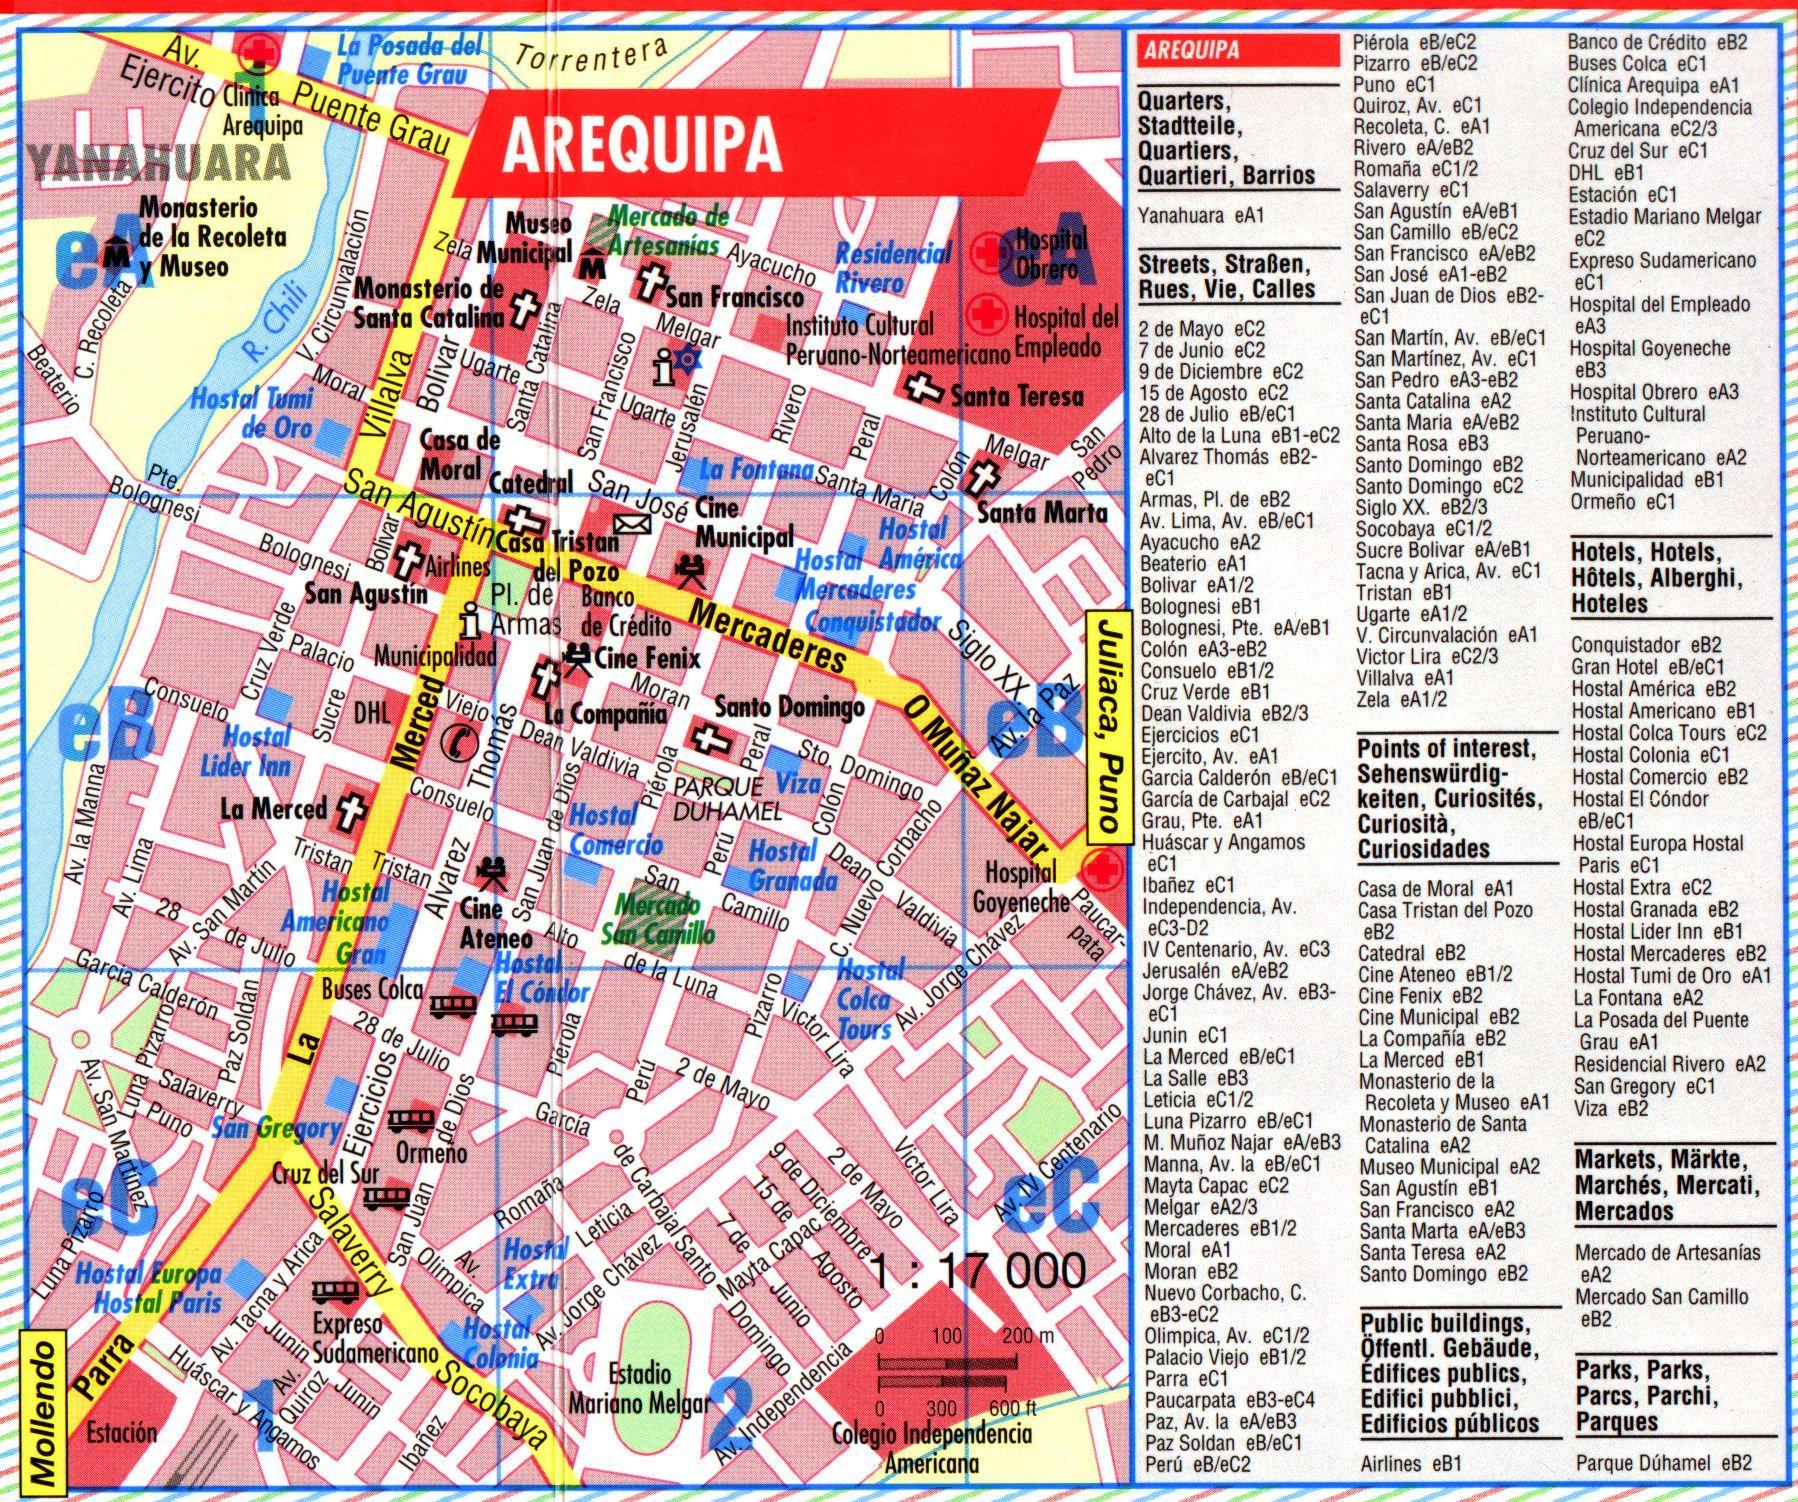 Arequipa tourist map arequipa peru mappery peru pinterest arequipa tourist map arequipa peru mappery sciox Gallery